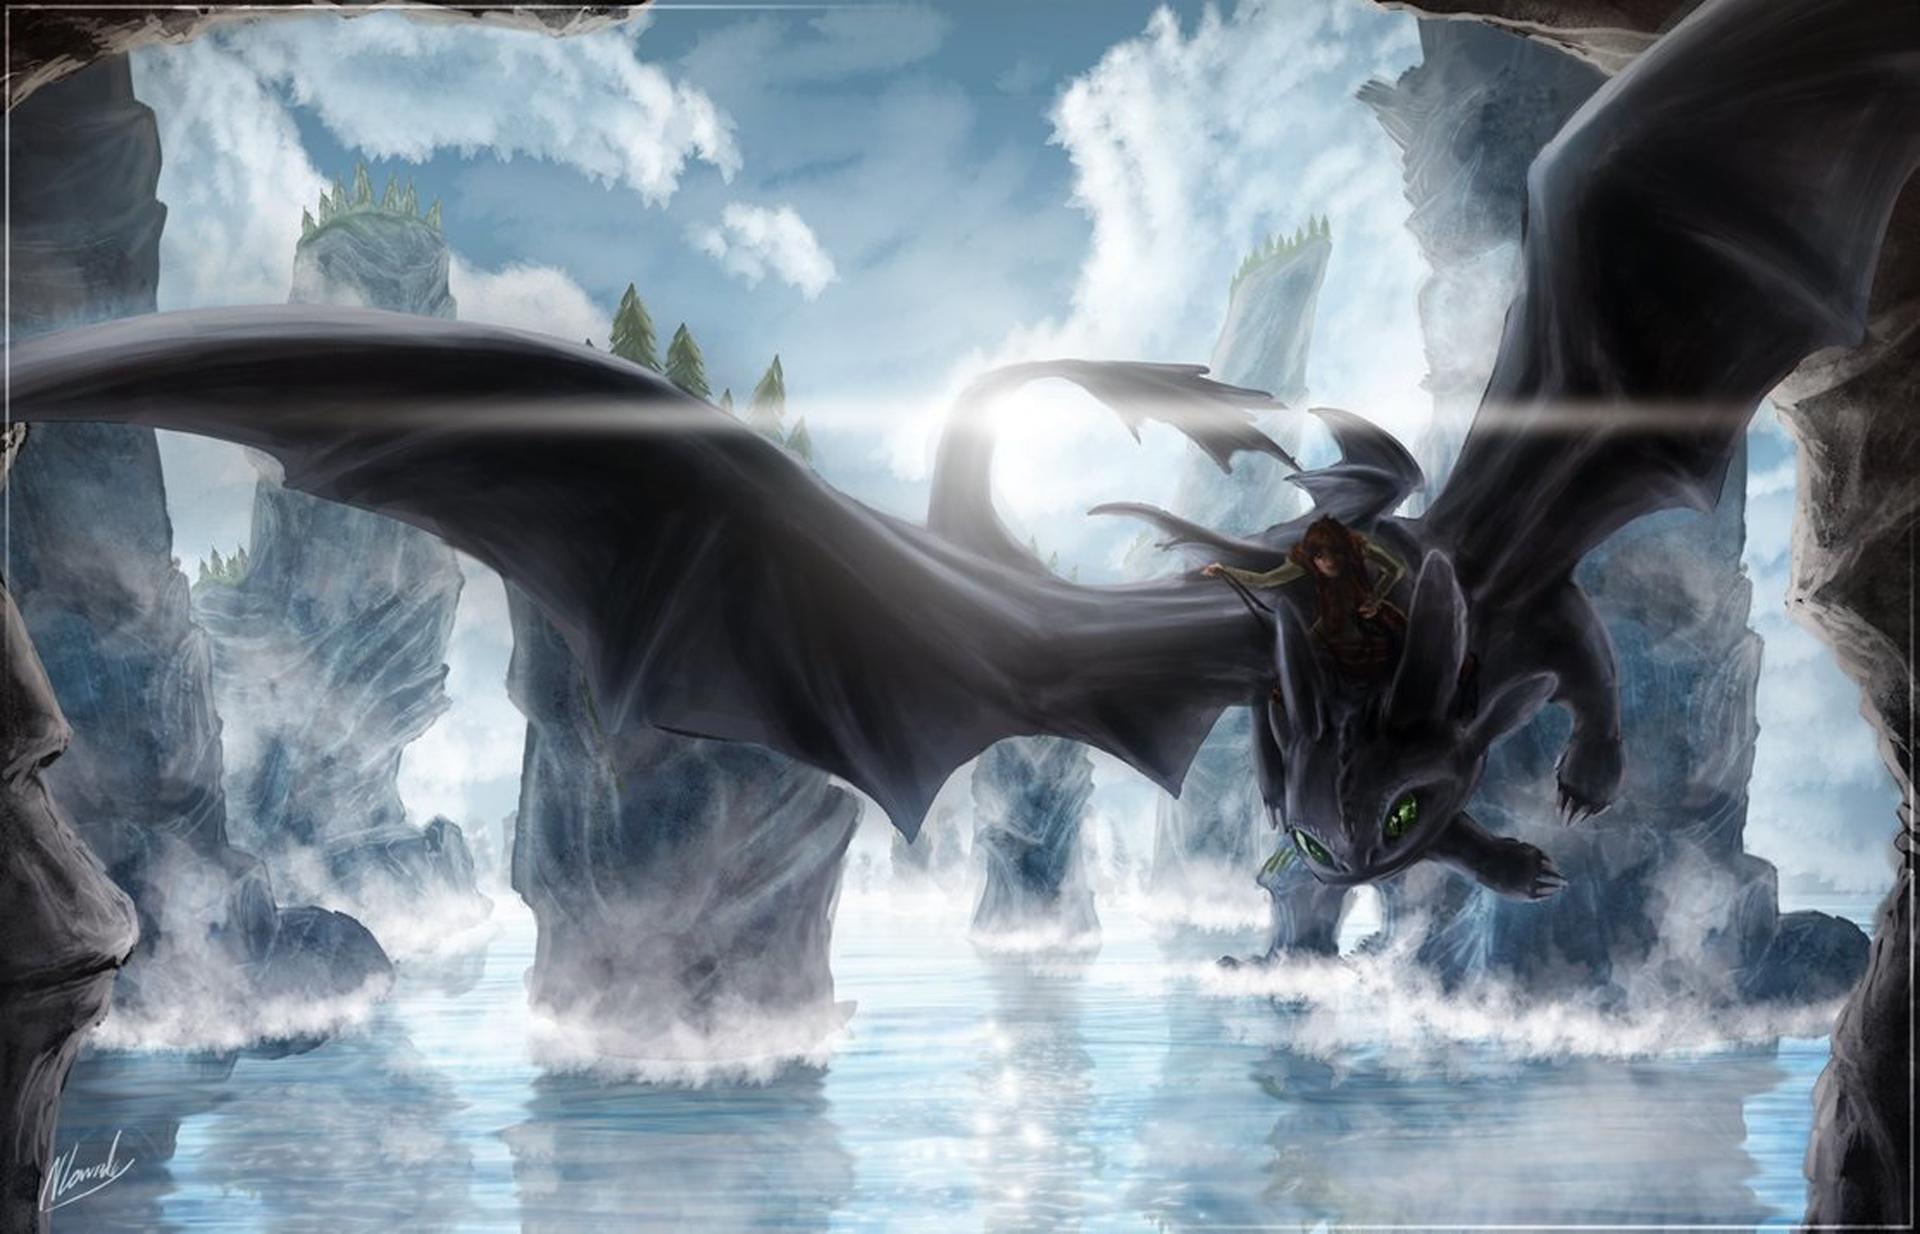 Nightfury How to Train Your Dragon 2 Wallpapers Desktop Backgrounds 1920x1234